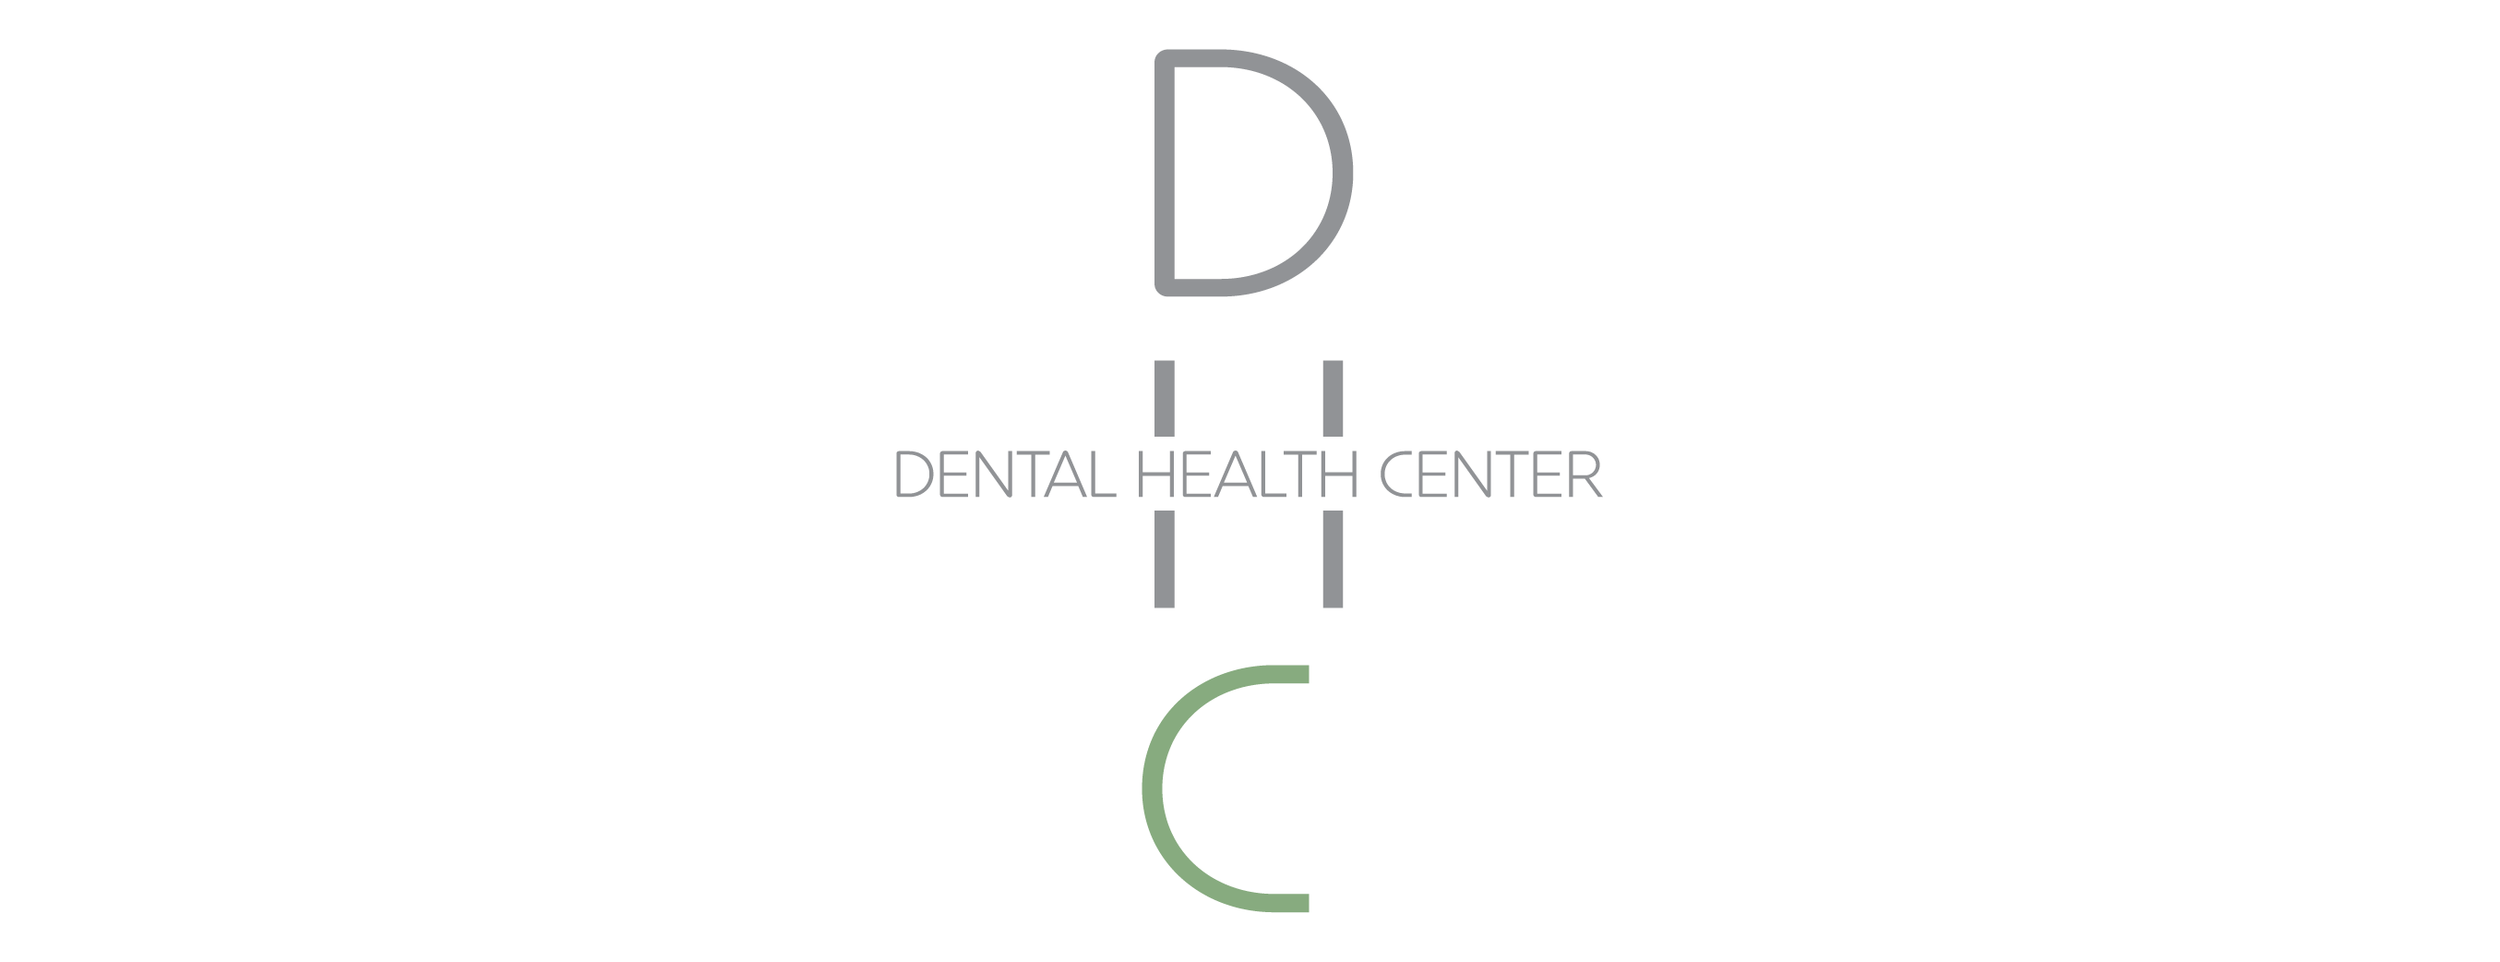 Dental Health Center